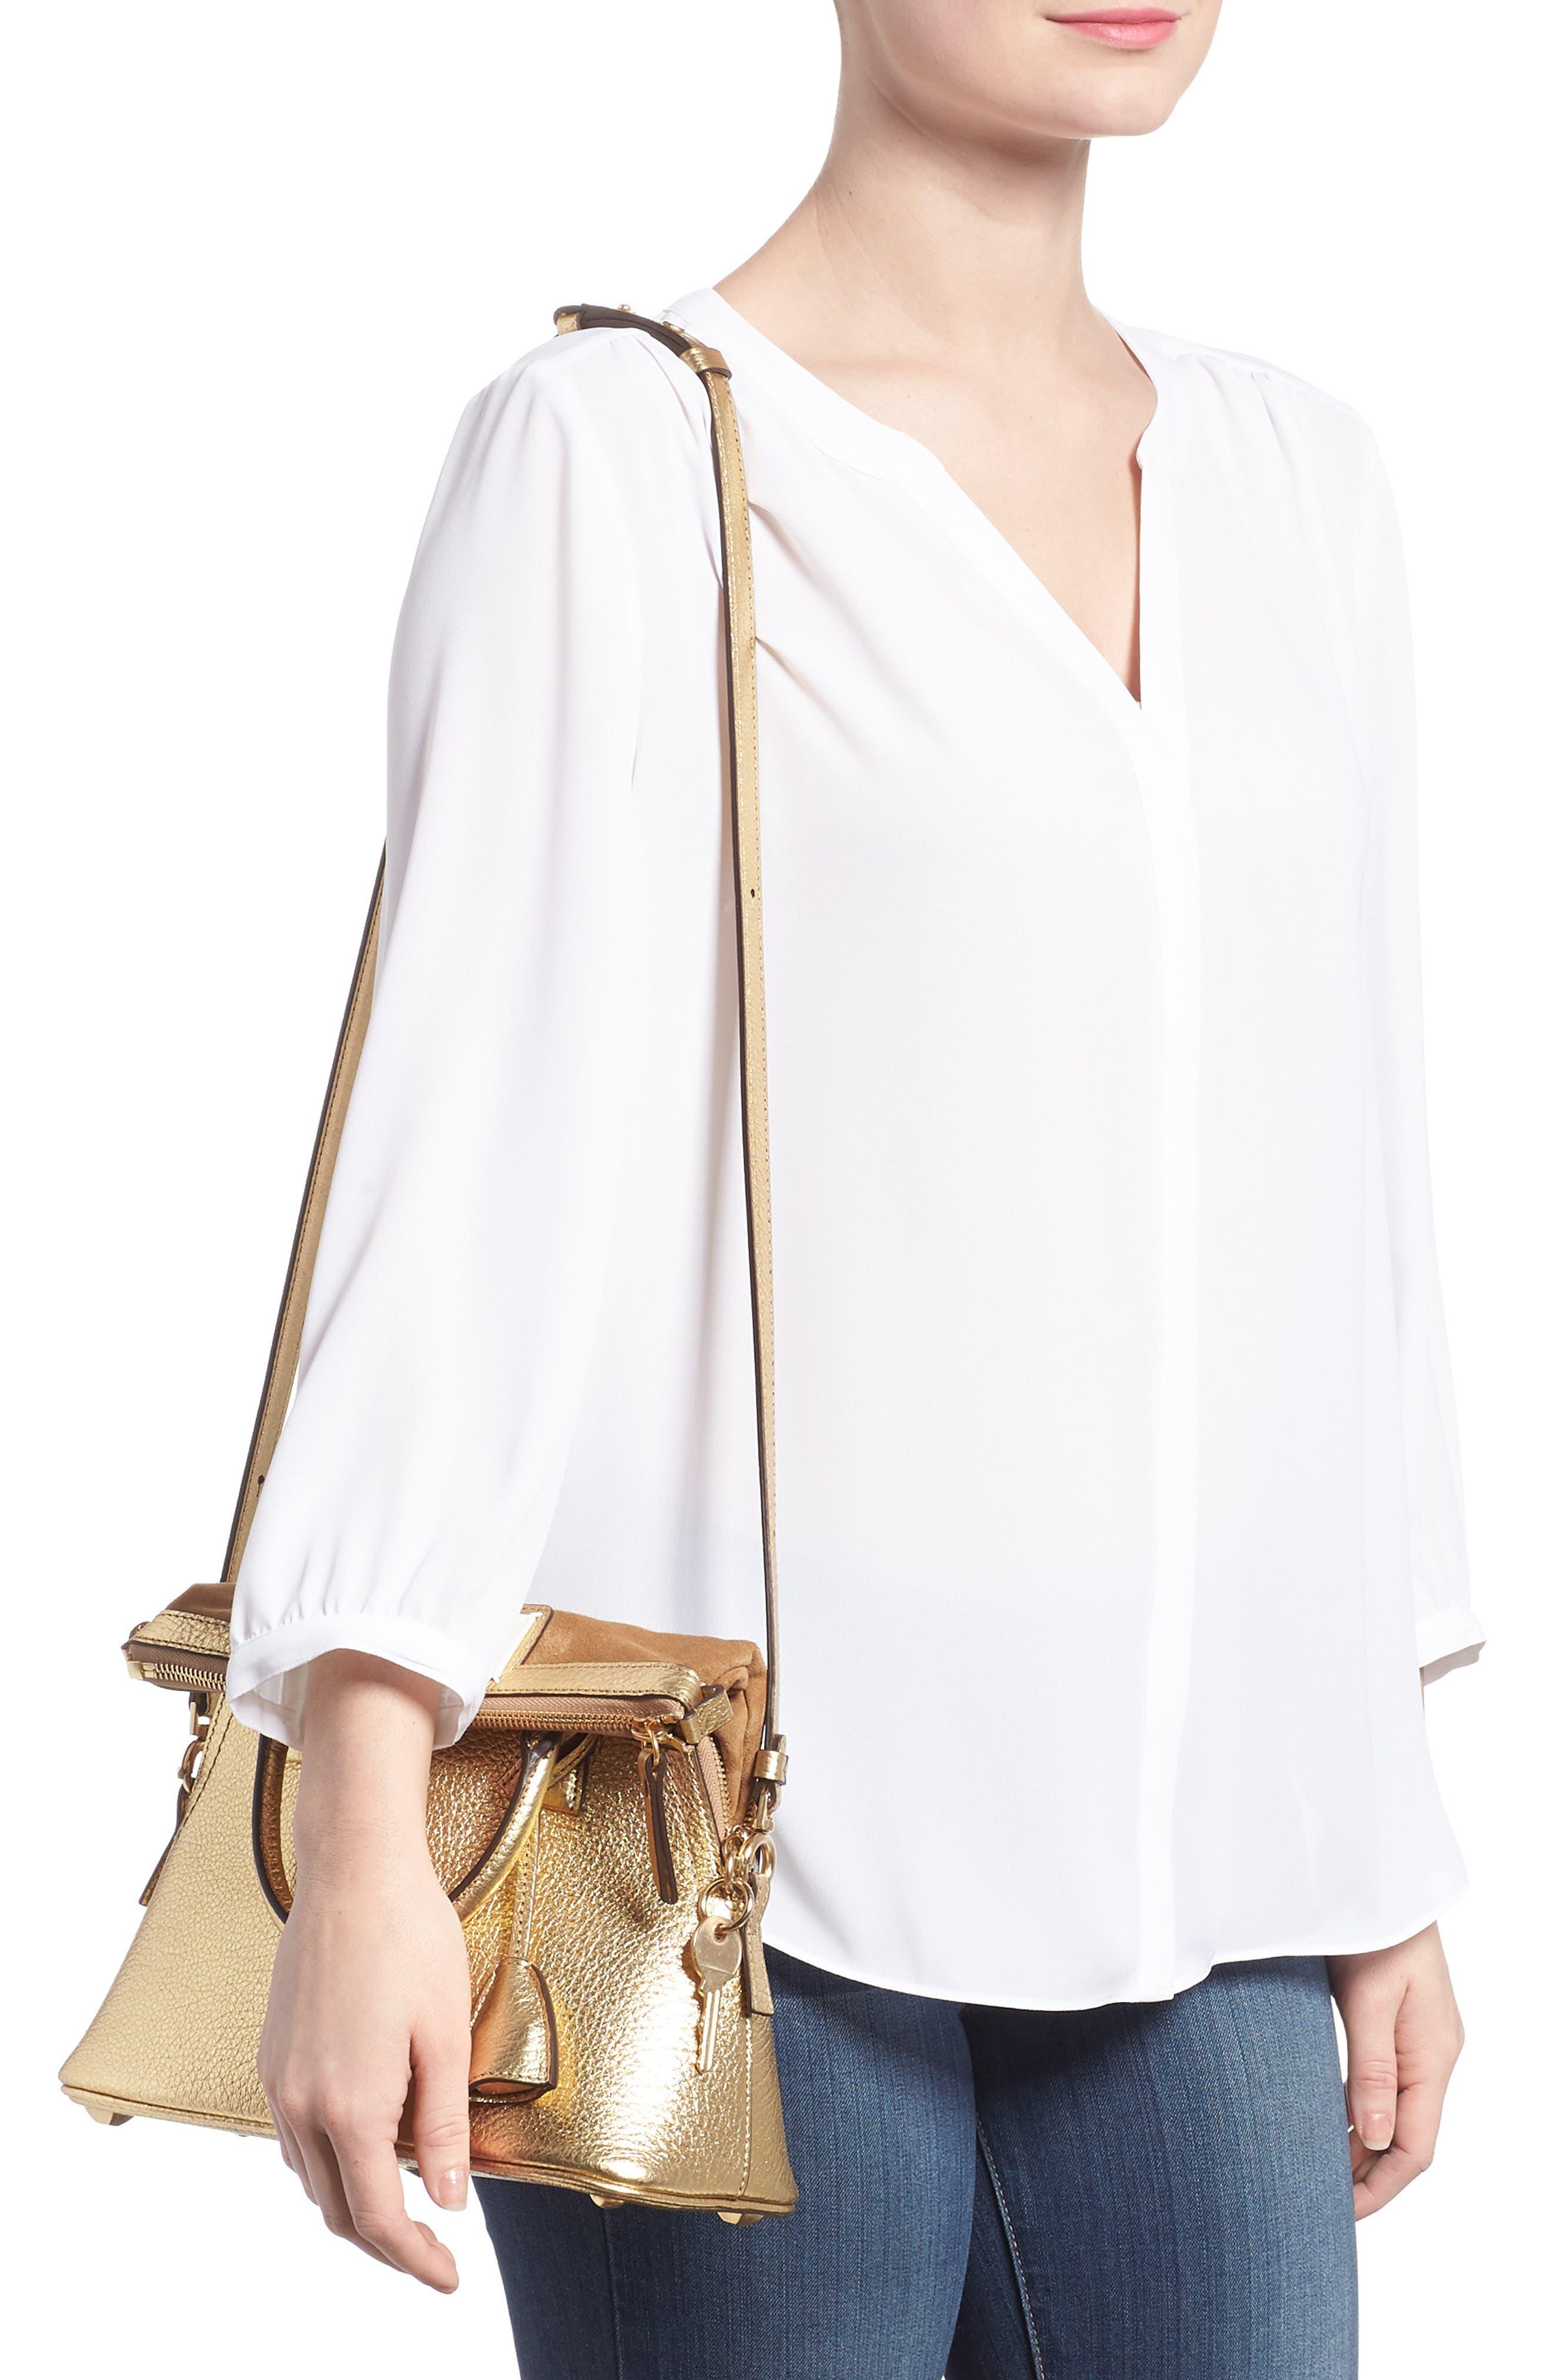 Small 5AC Calfskin Leather Handbag,                             Alternate thumbnail 2, color,                             Gold